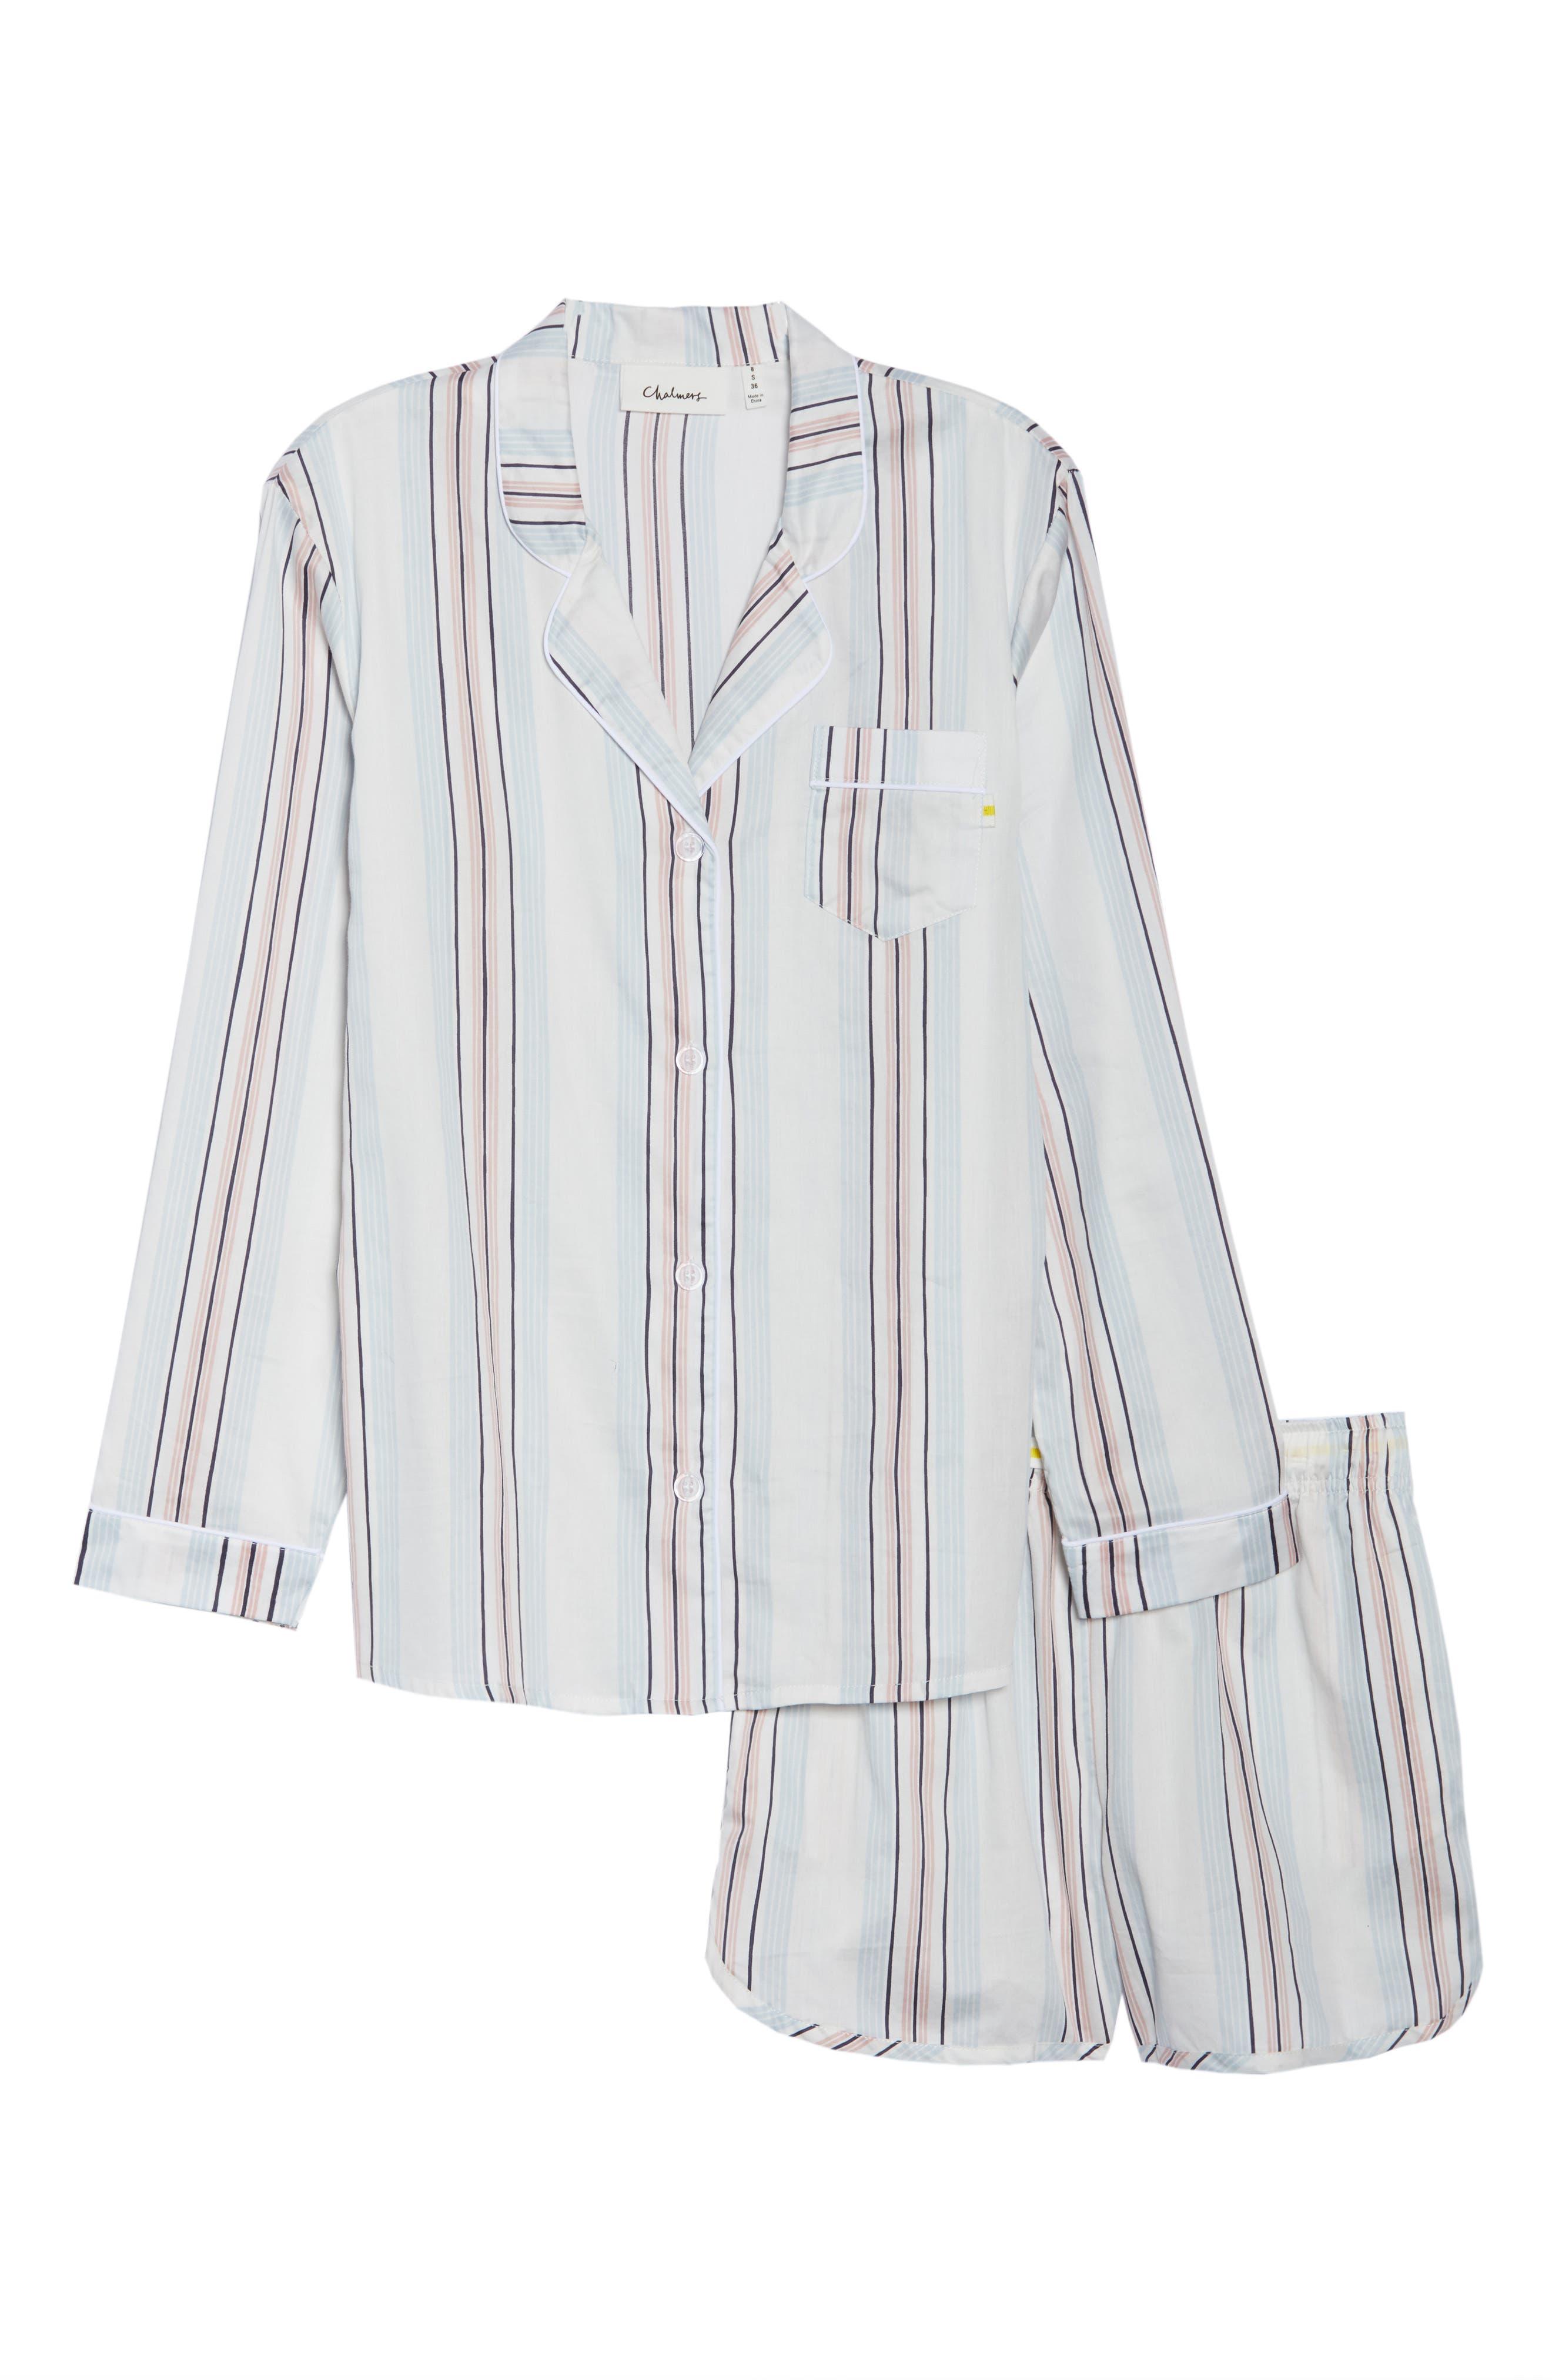 Candy Stripe Short Pajamas,                             Alternate thumbnail 6, color,                             110